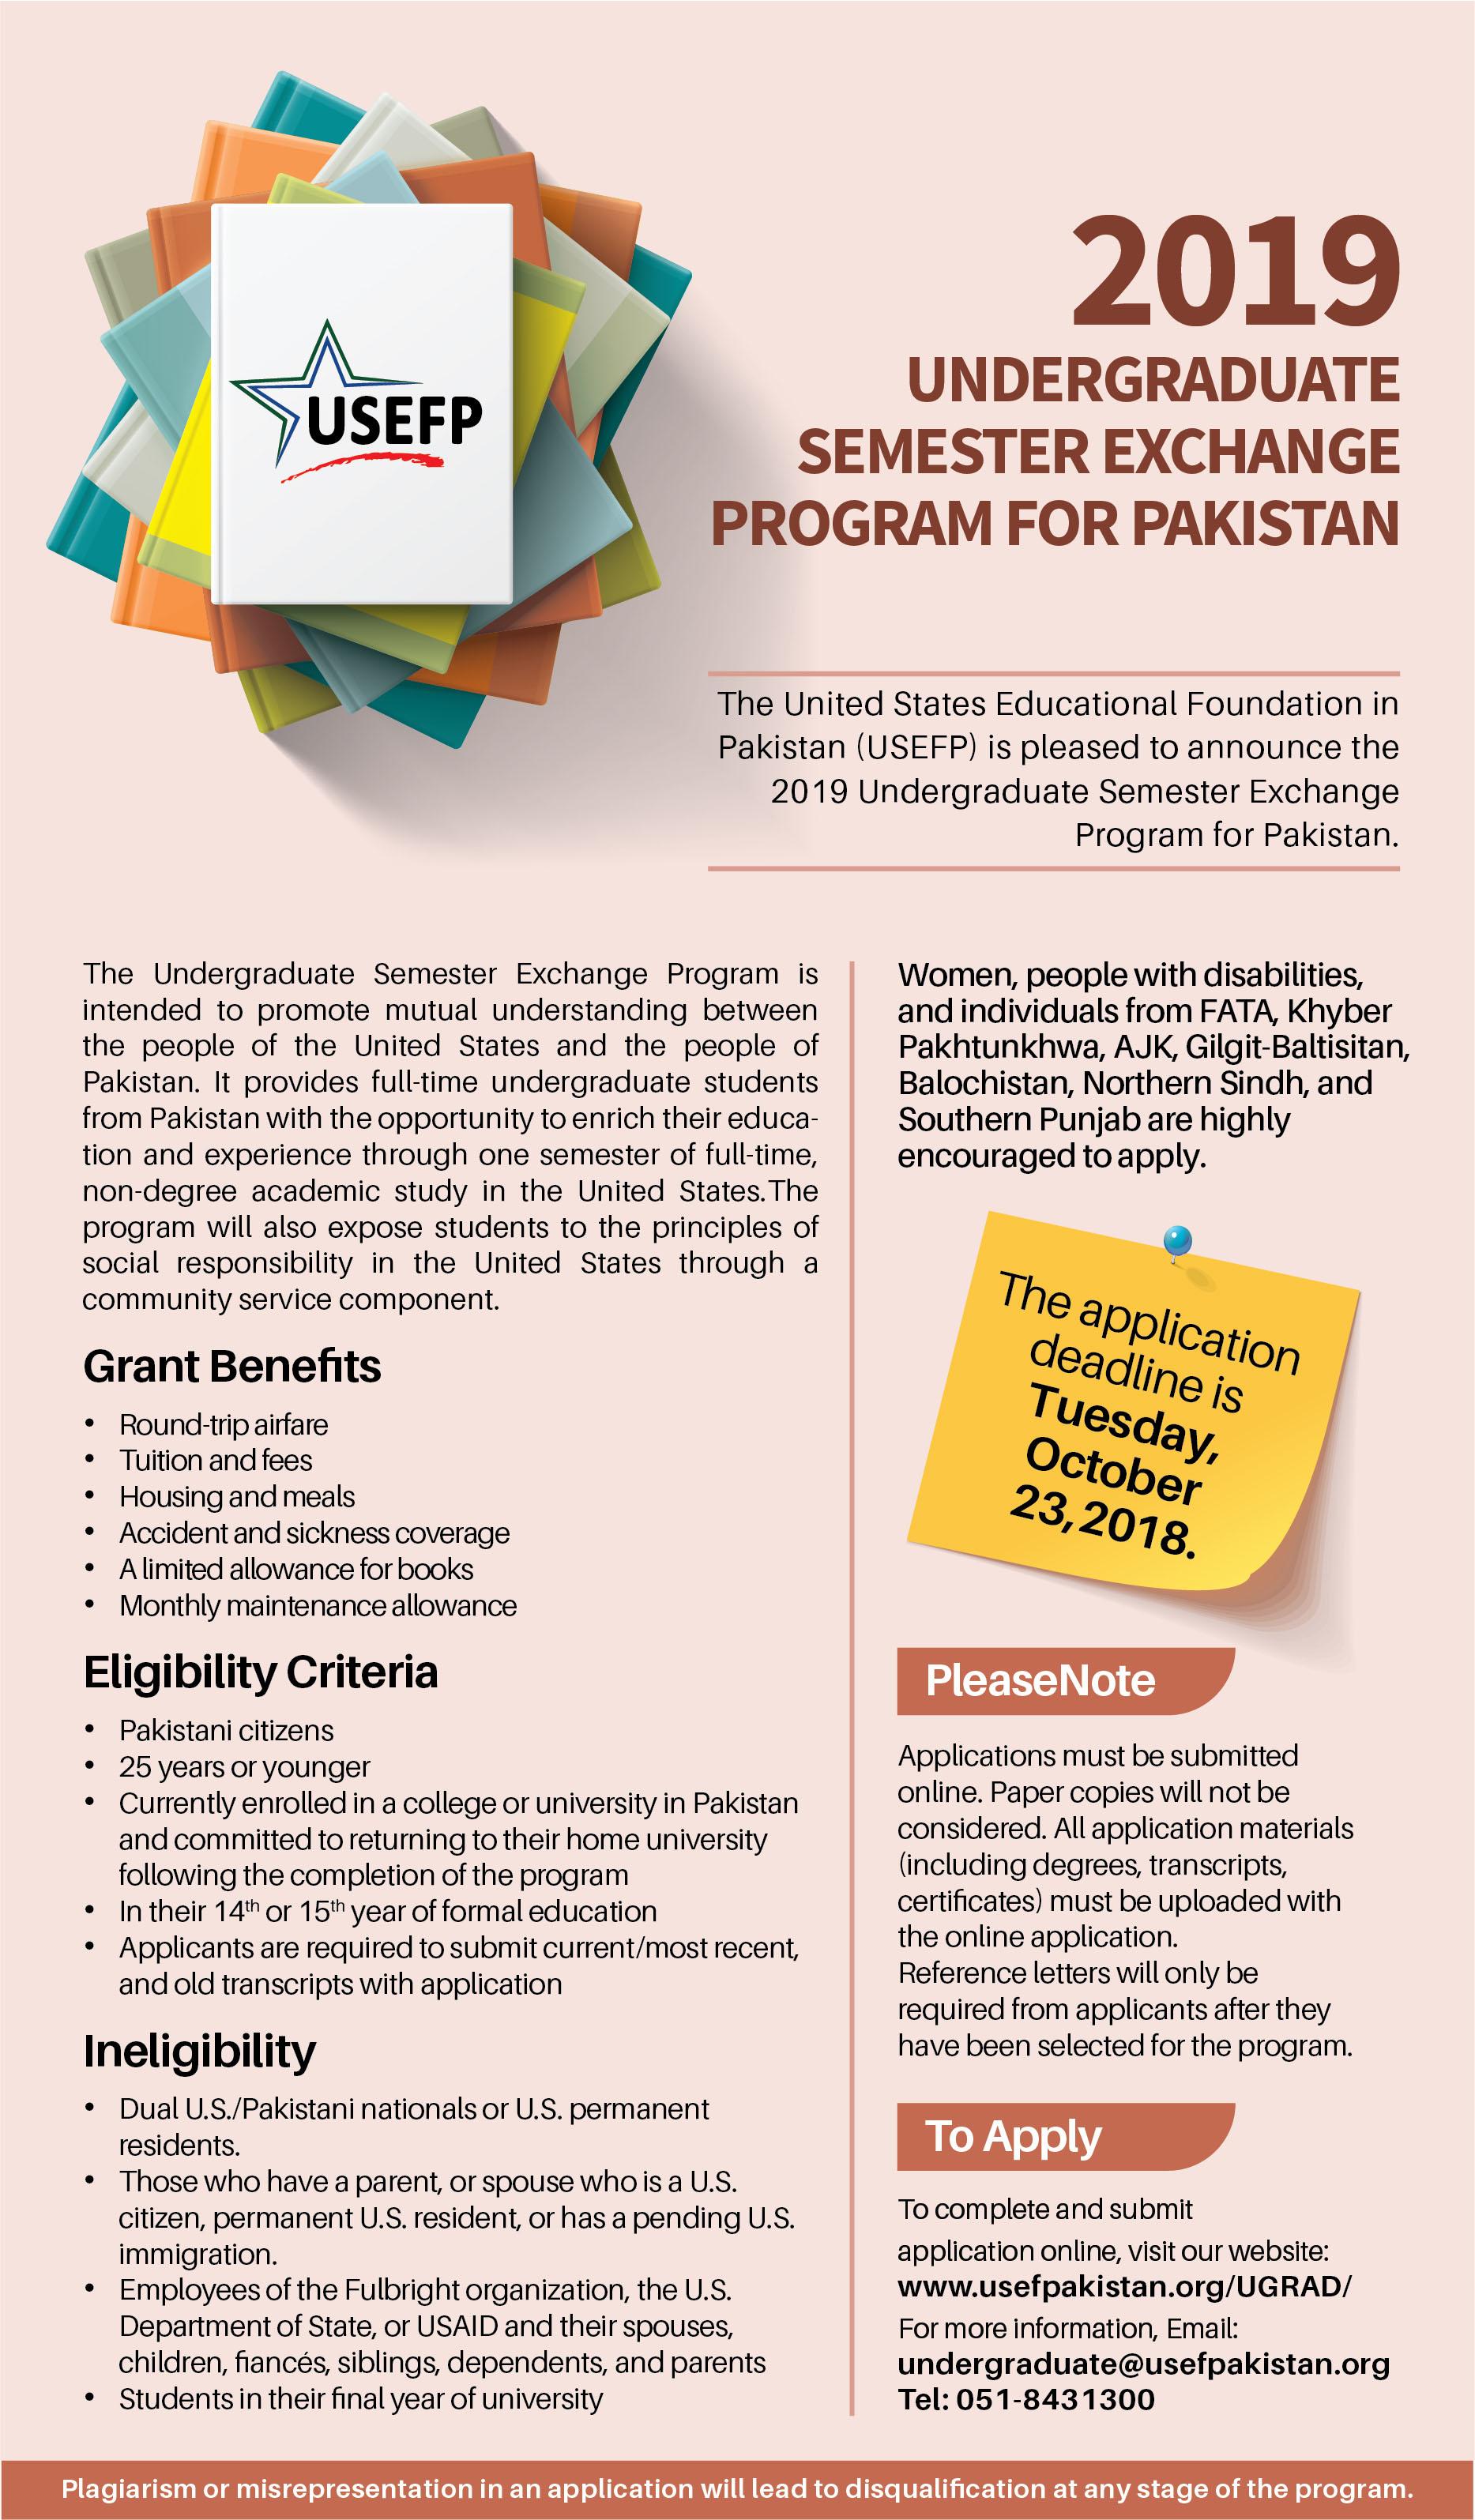 Usefp Global Undergraduate Program Ugrad